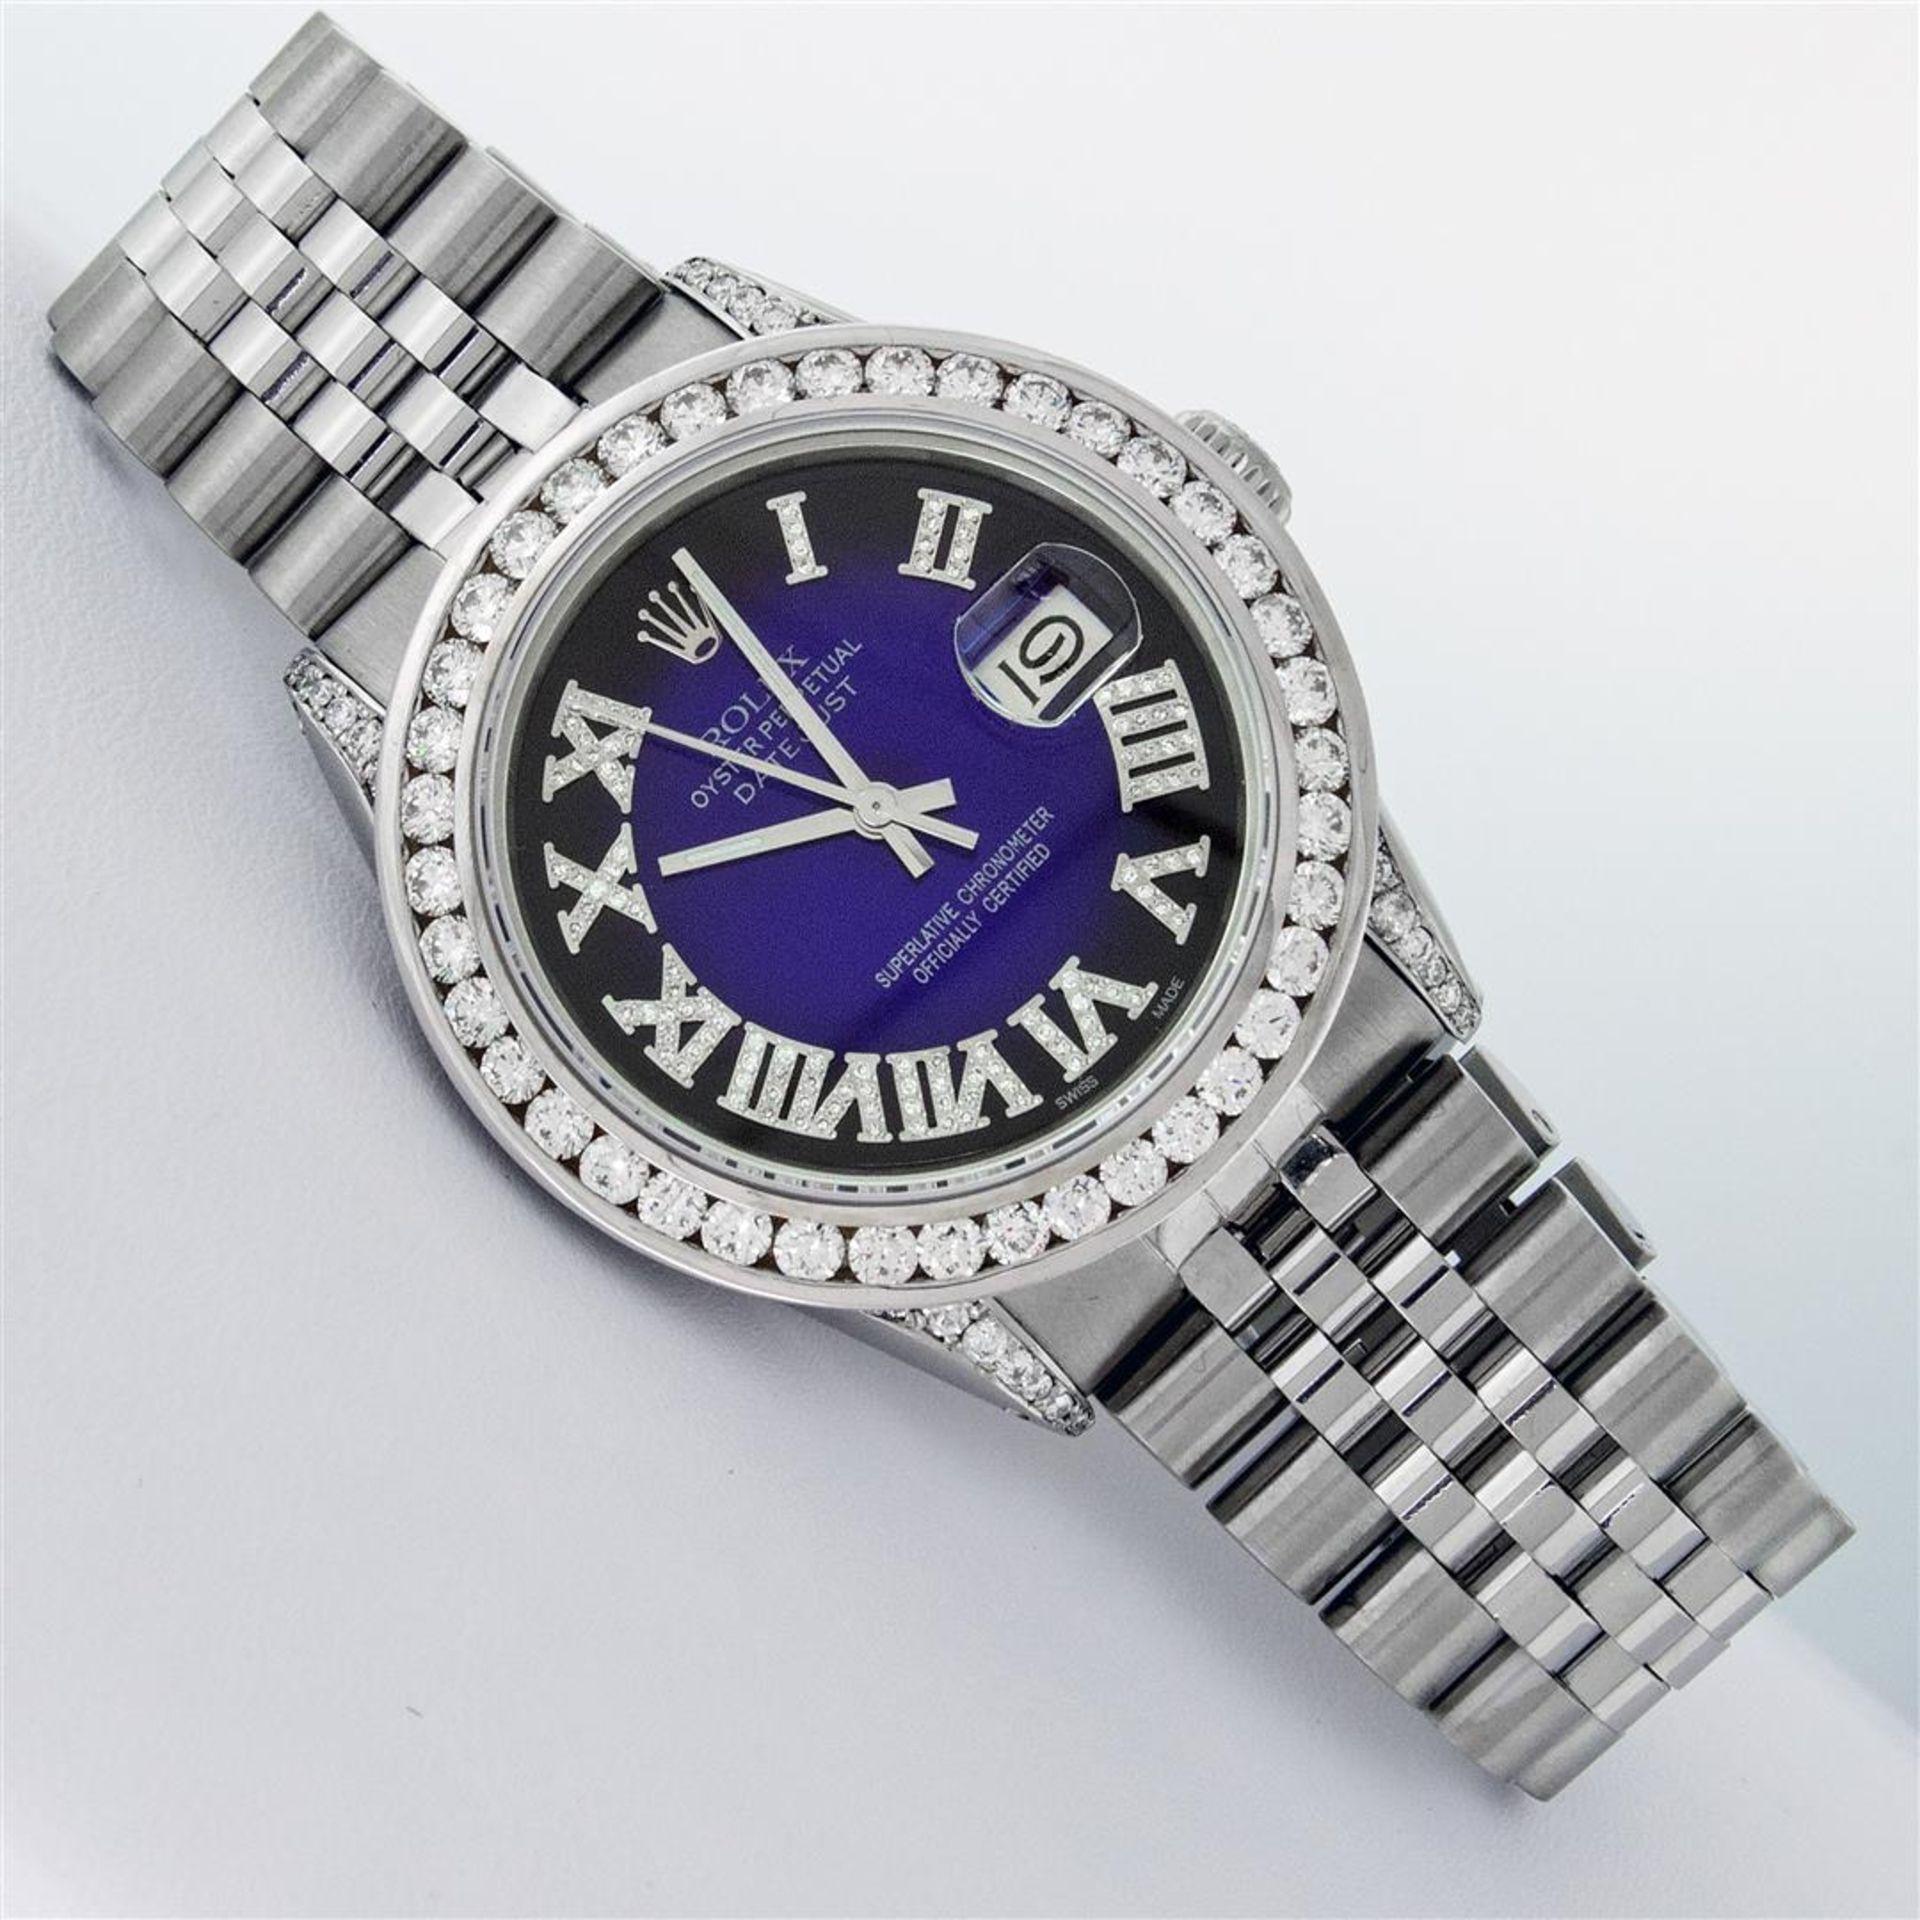 Rolex Mens Stainless Steel Blue Vignette Roman 3ctw Diamond Datejust Wristwatch - Image 3 of 9